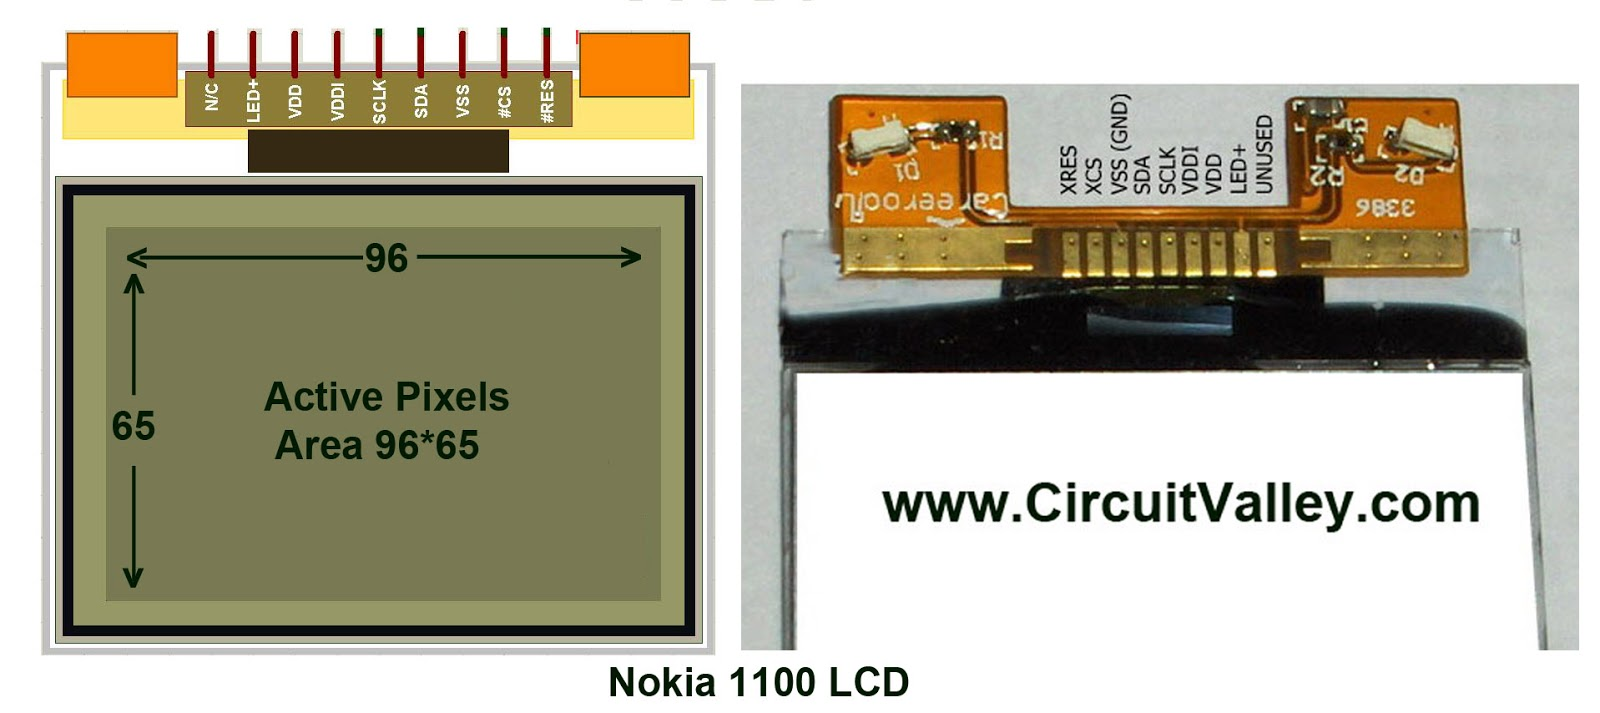 Nokia 1100 LCD Pinout